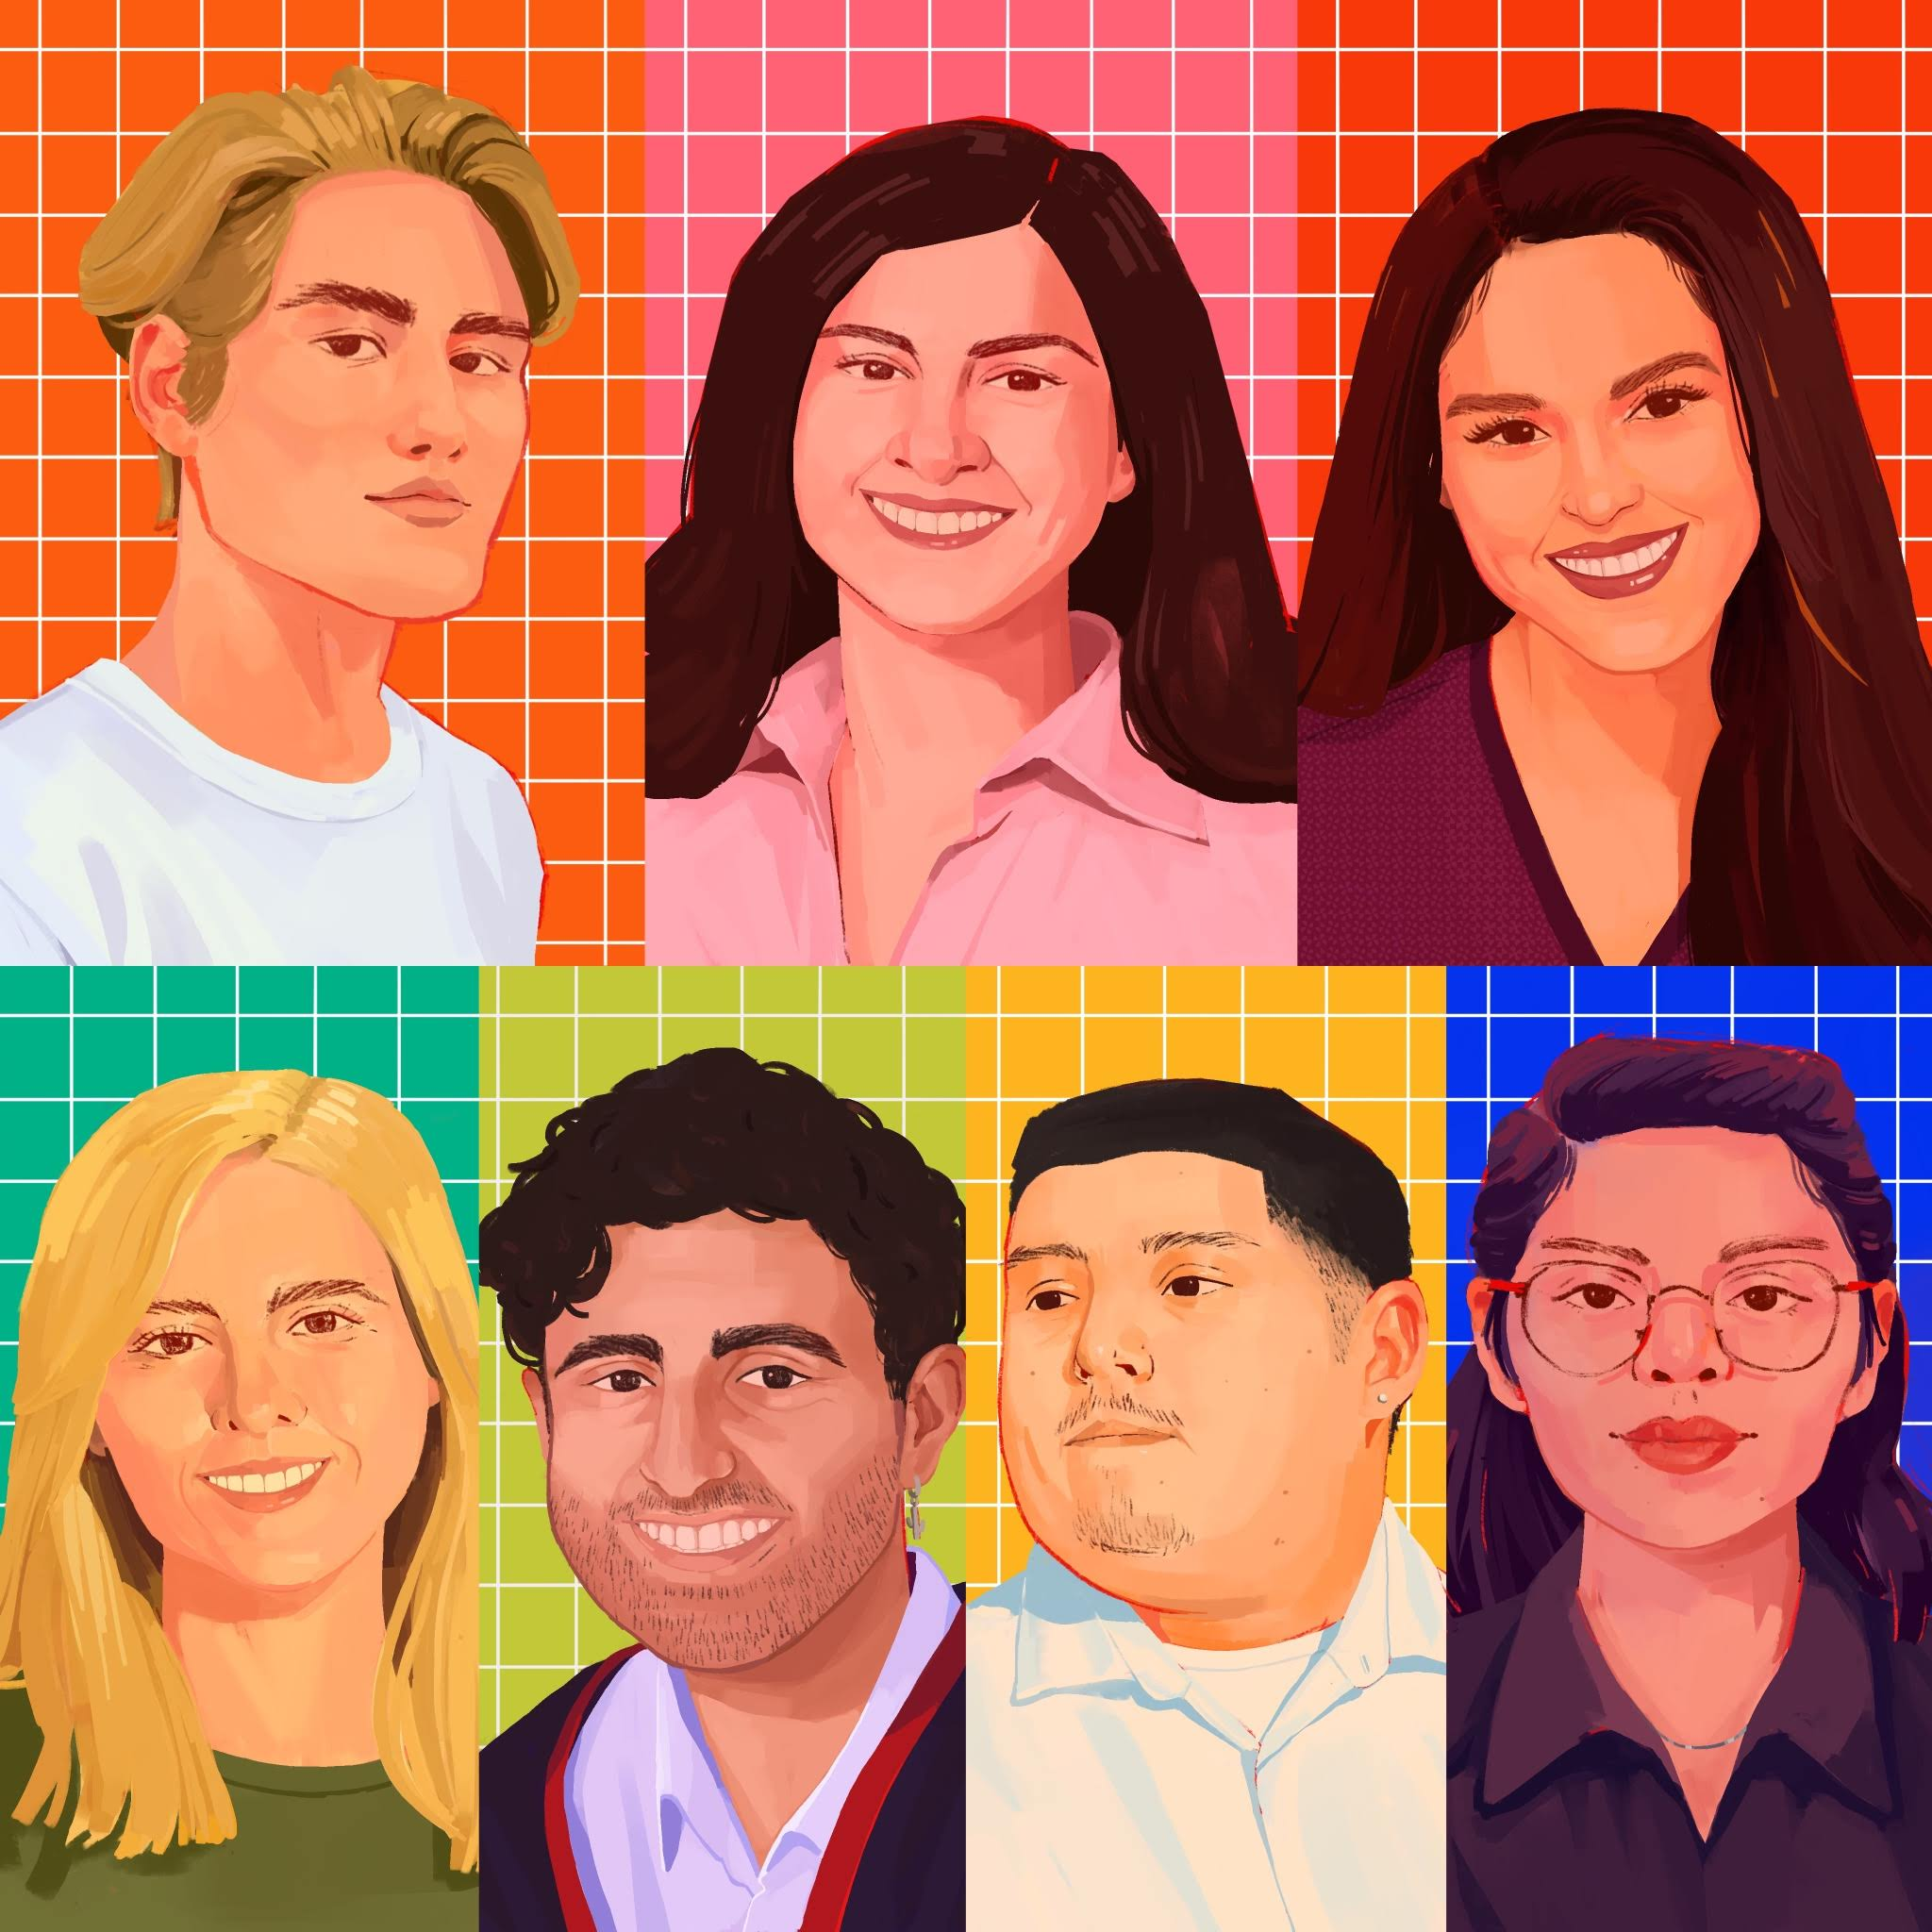 Next Generation Radio CSUN Portraits